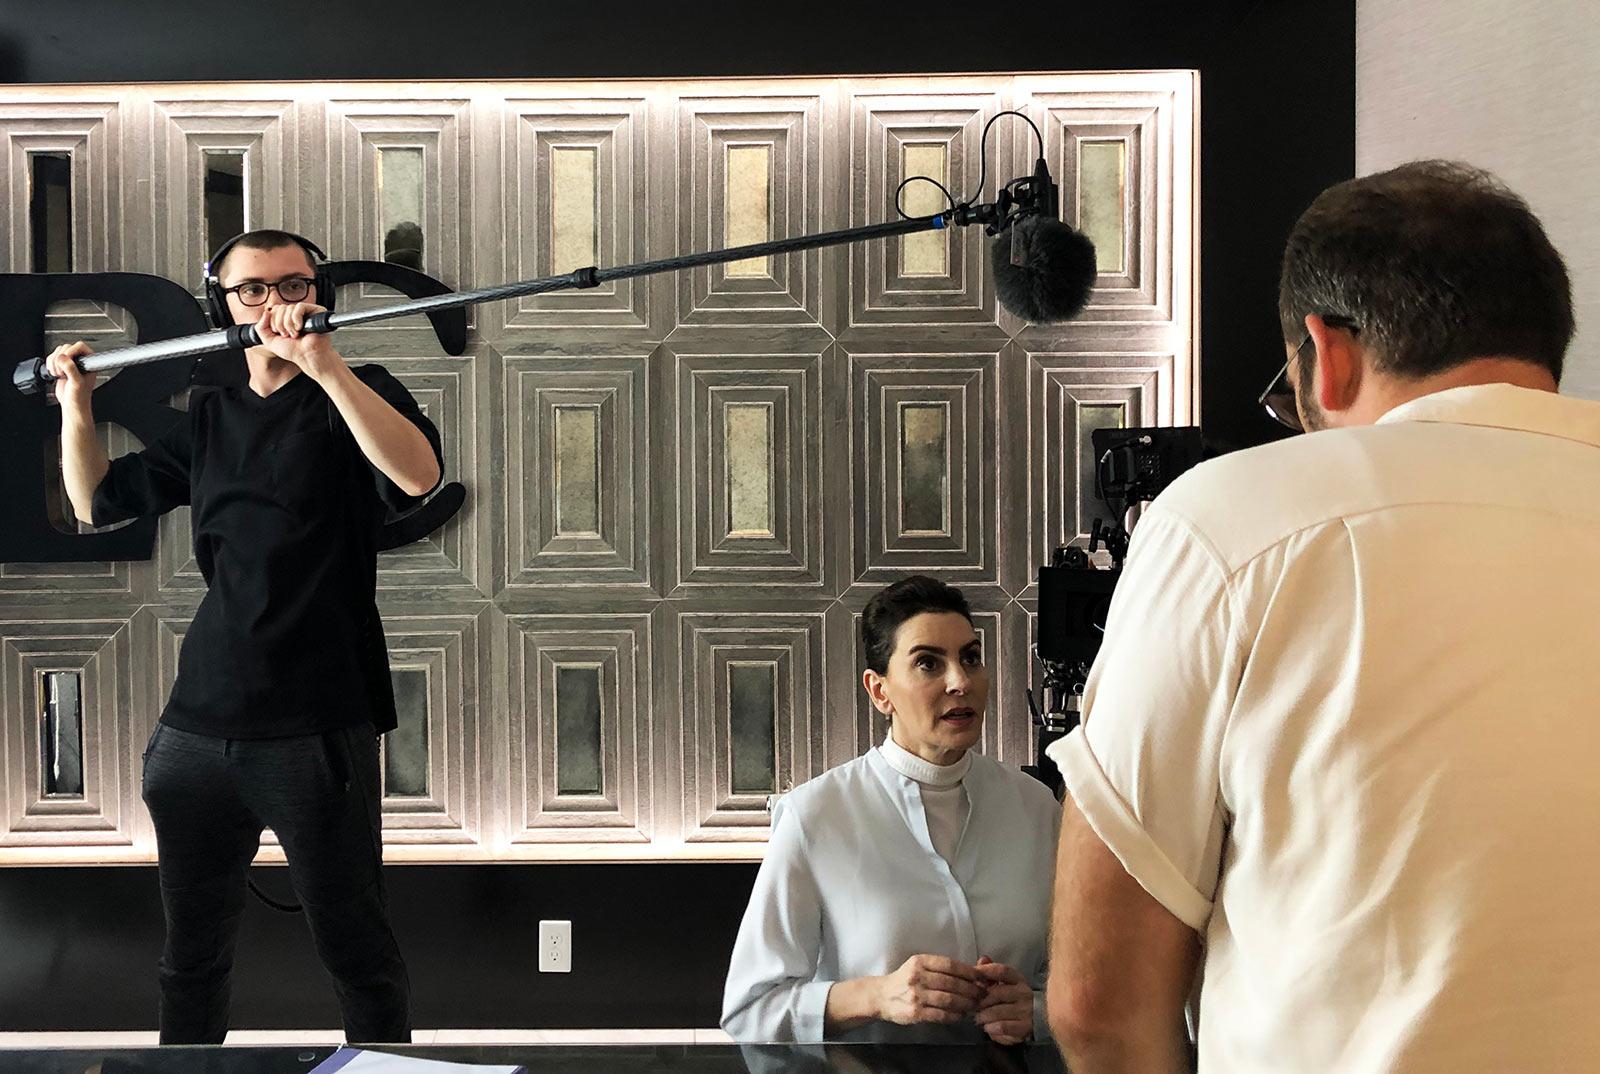 Ian Orlando Booms Sanken CS-M1 Shotgun for Feature Film